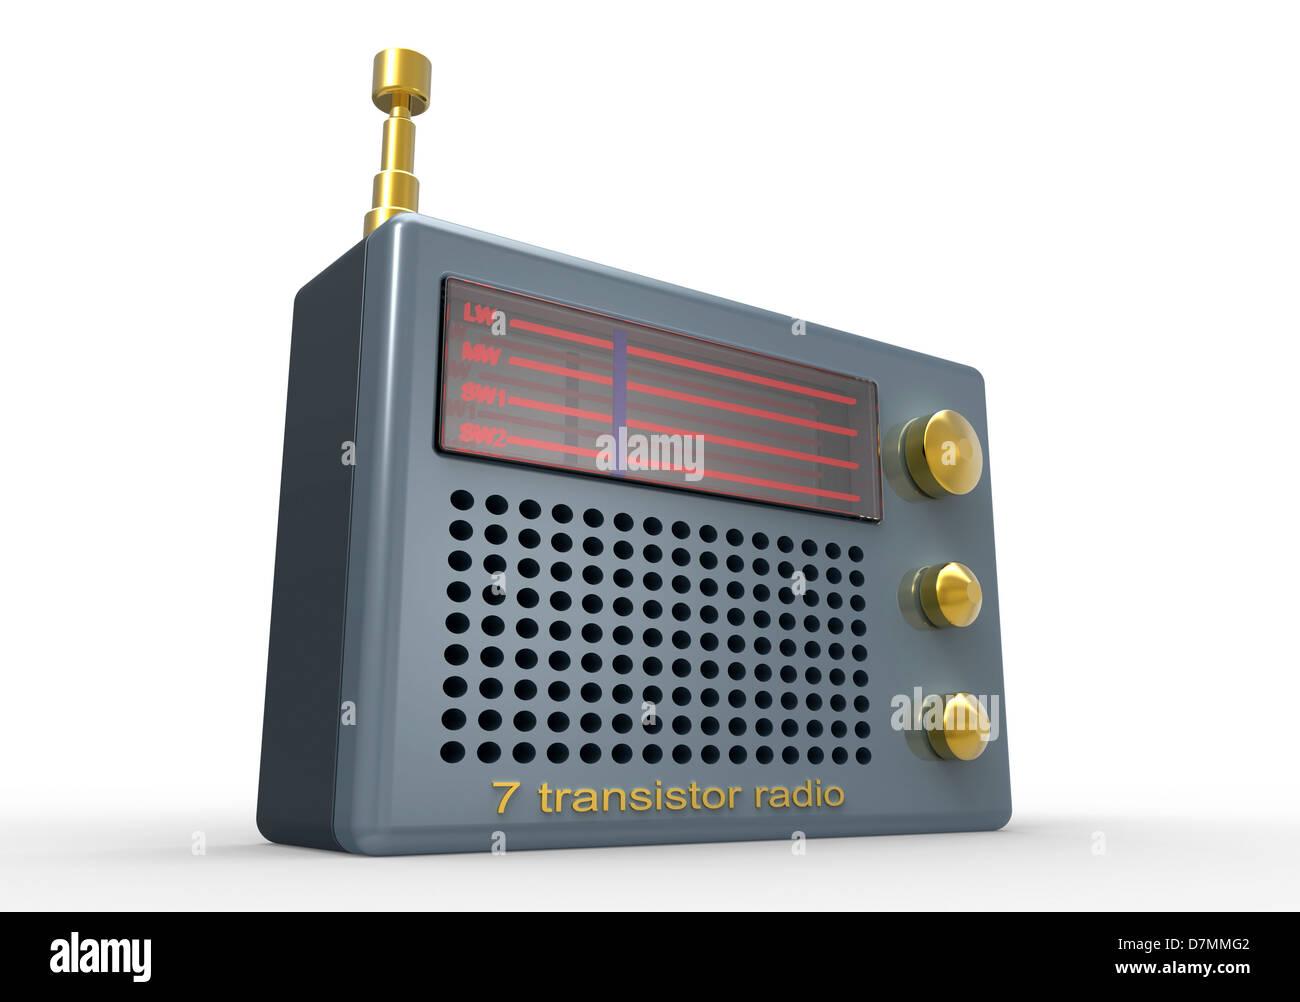 Radio, artwork - Stock Image